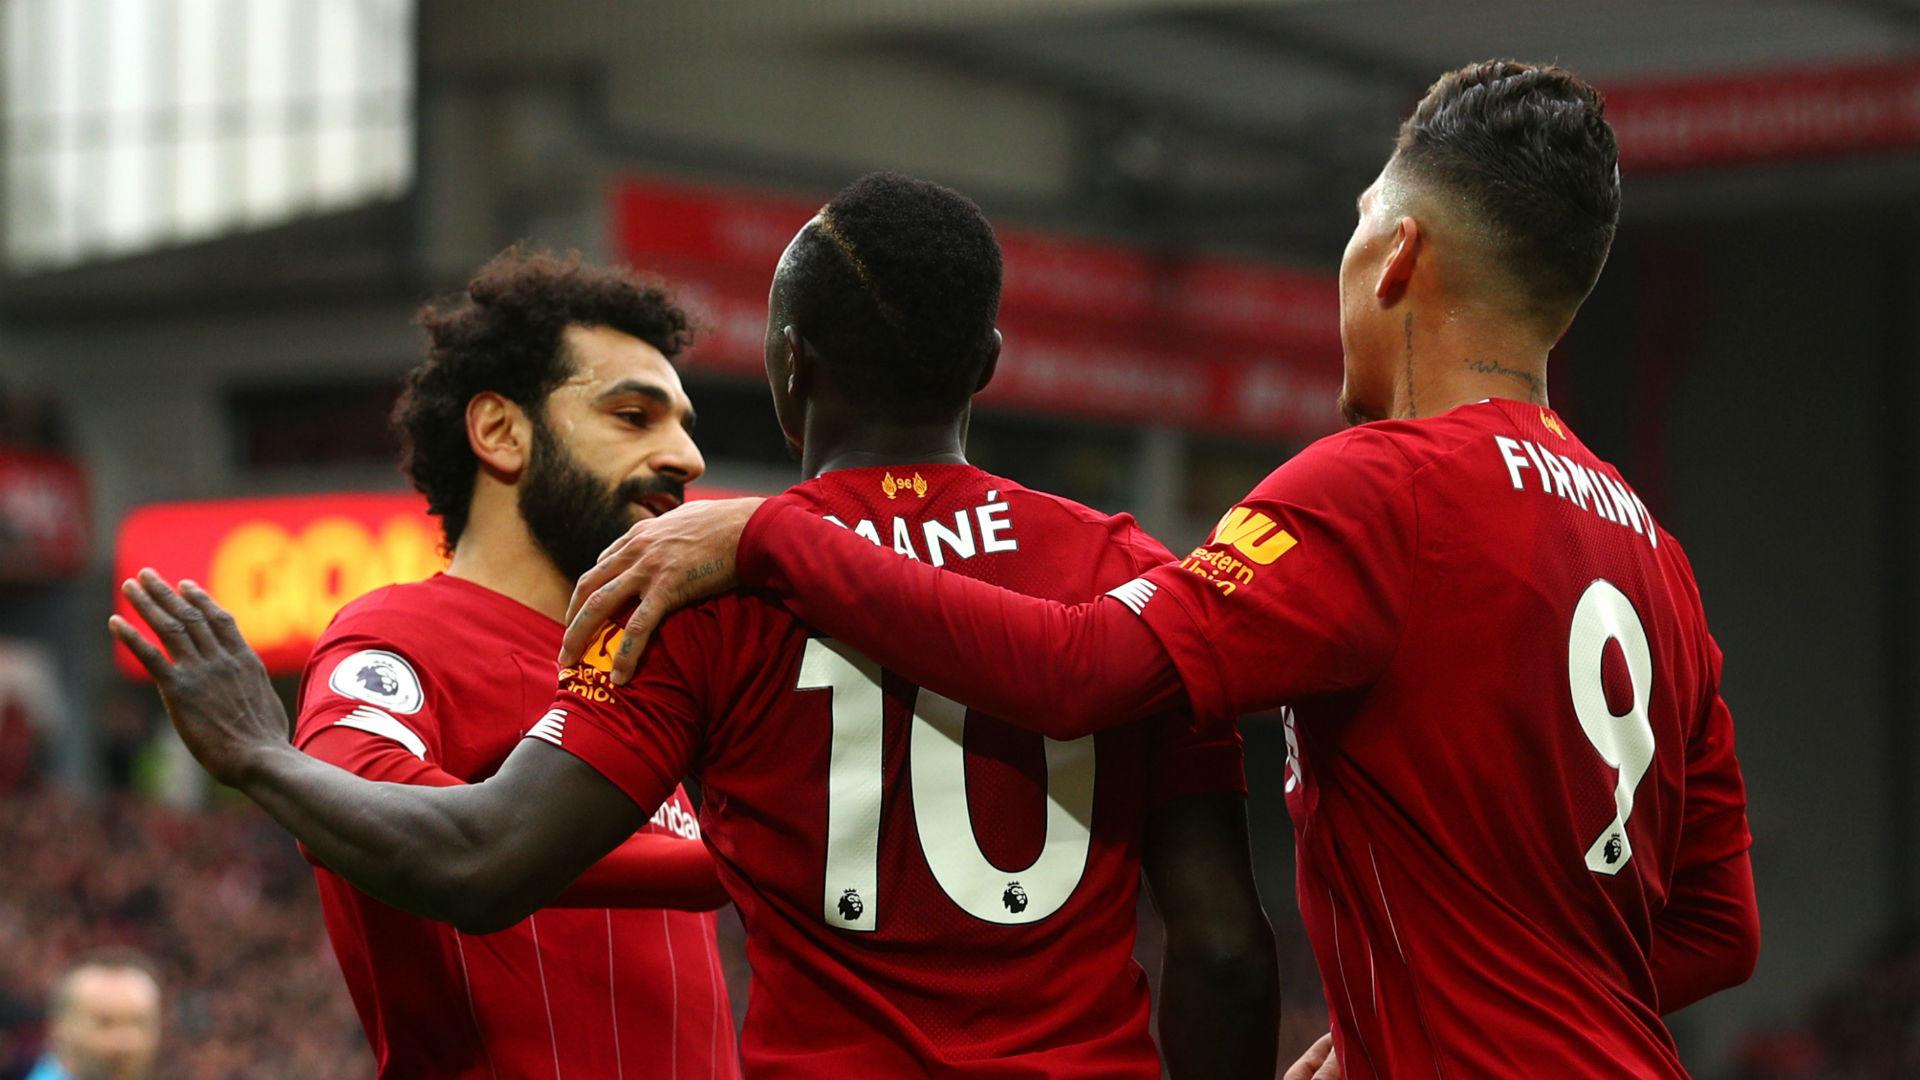 Arsenal defender Mari names Liverpool stars Salah, Mane and Firmino as toughest opponents